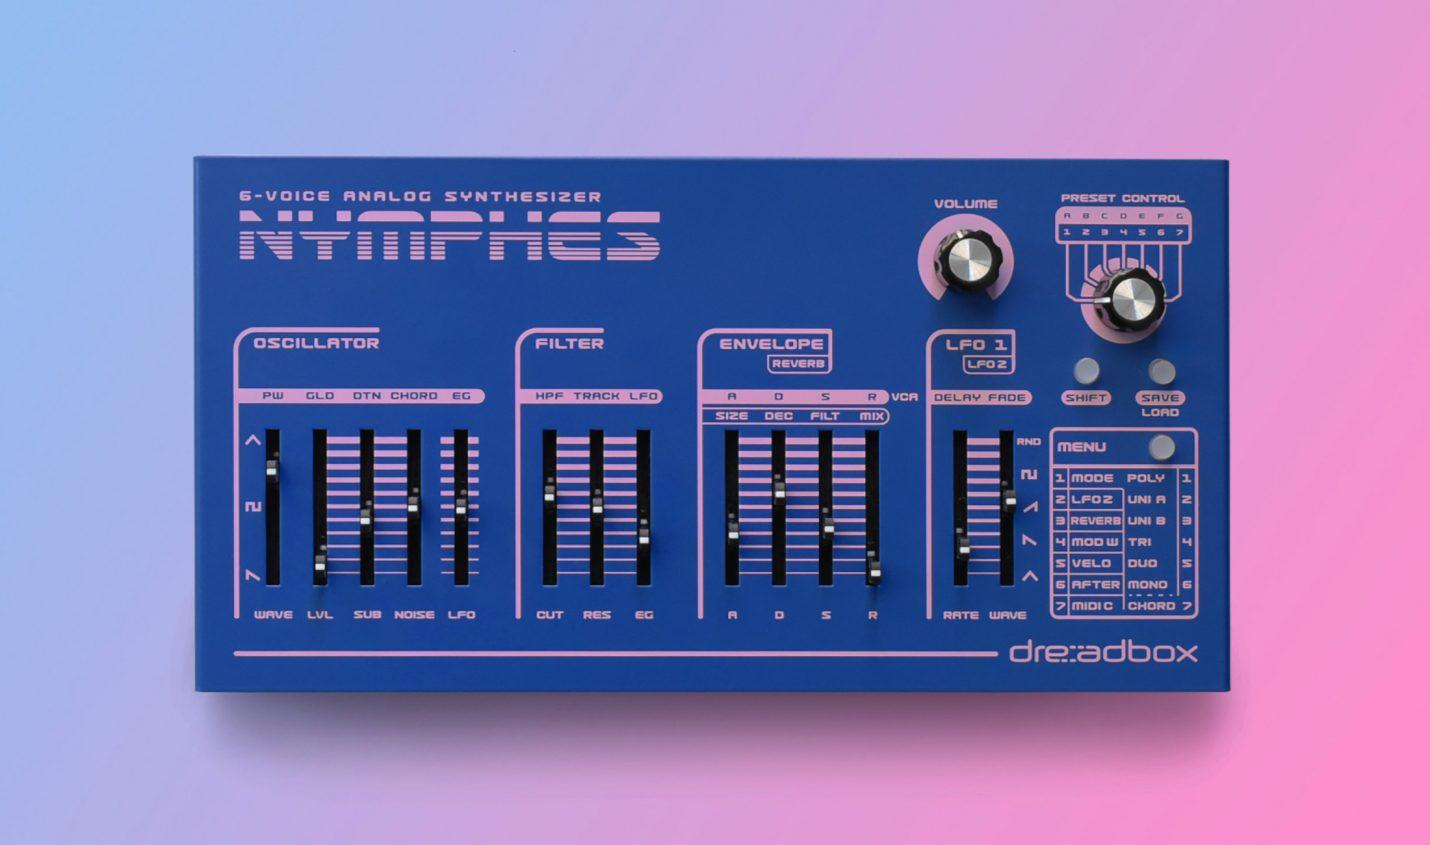 Superbooth 2021: Dreadbox Nymphes sechsstimmiger analoger Synthesizer vorgestellt